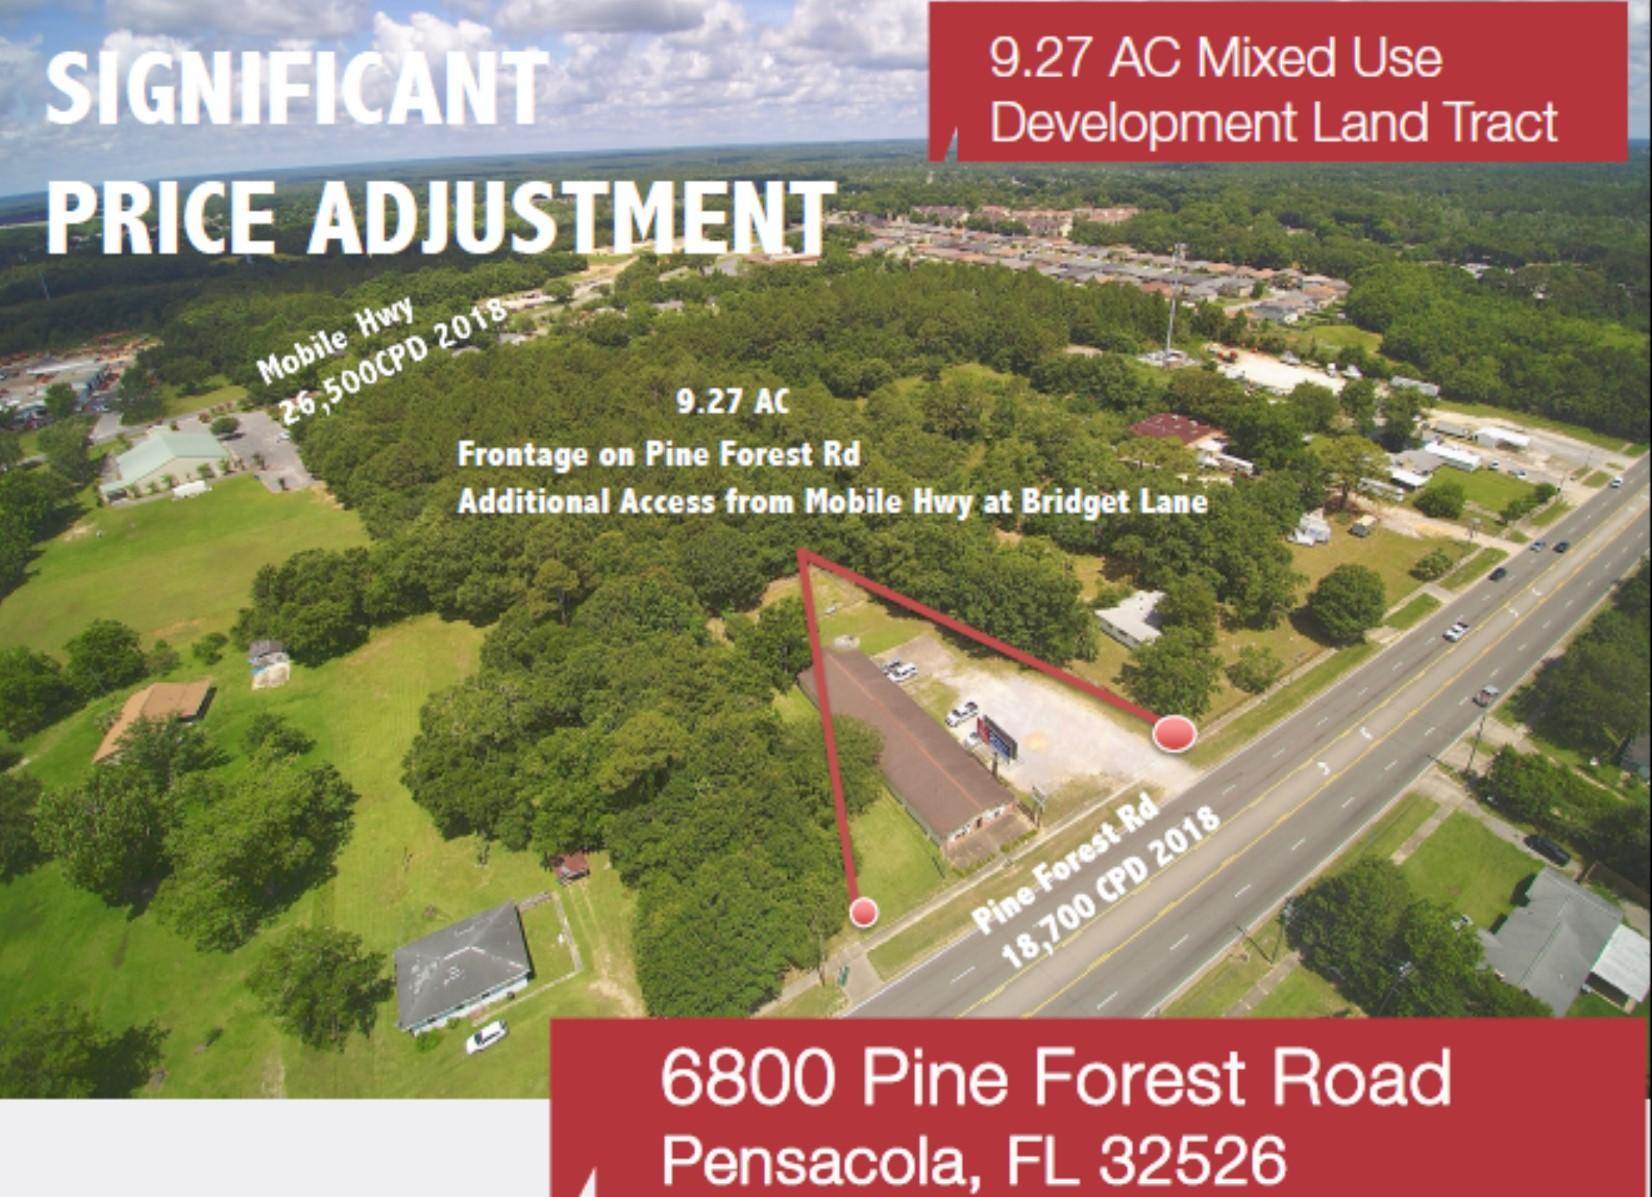 6800 Pine Forest Road, Pensacola, FL 32526